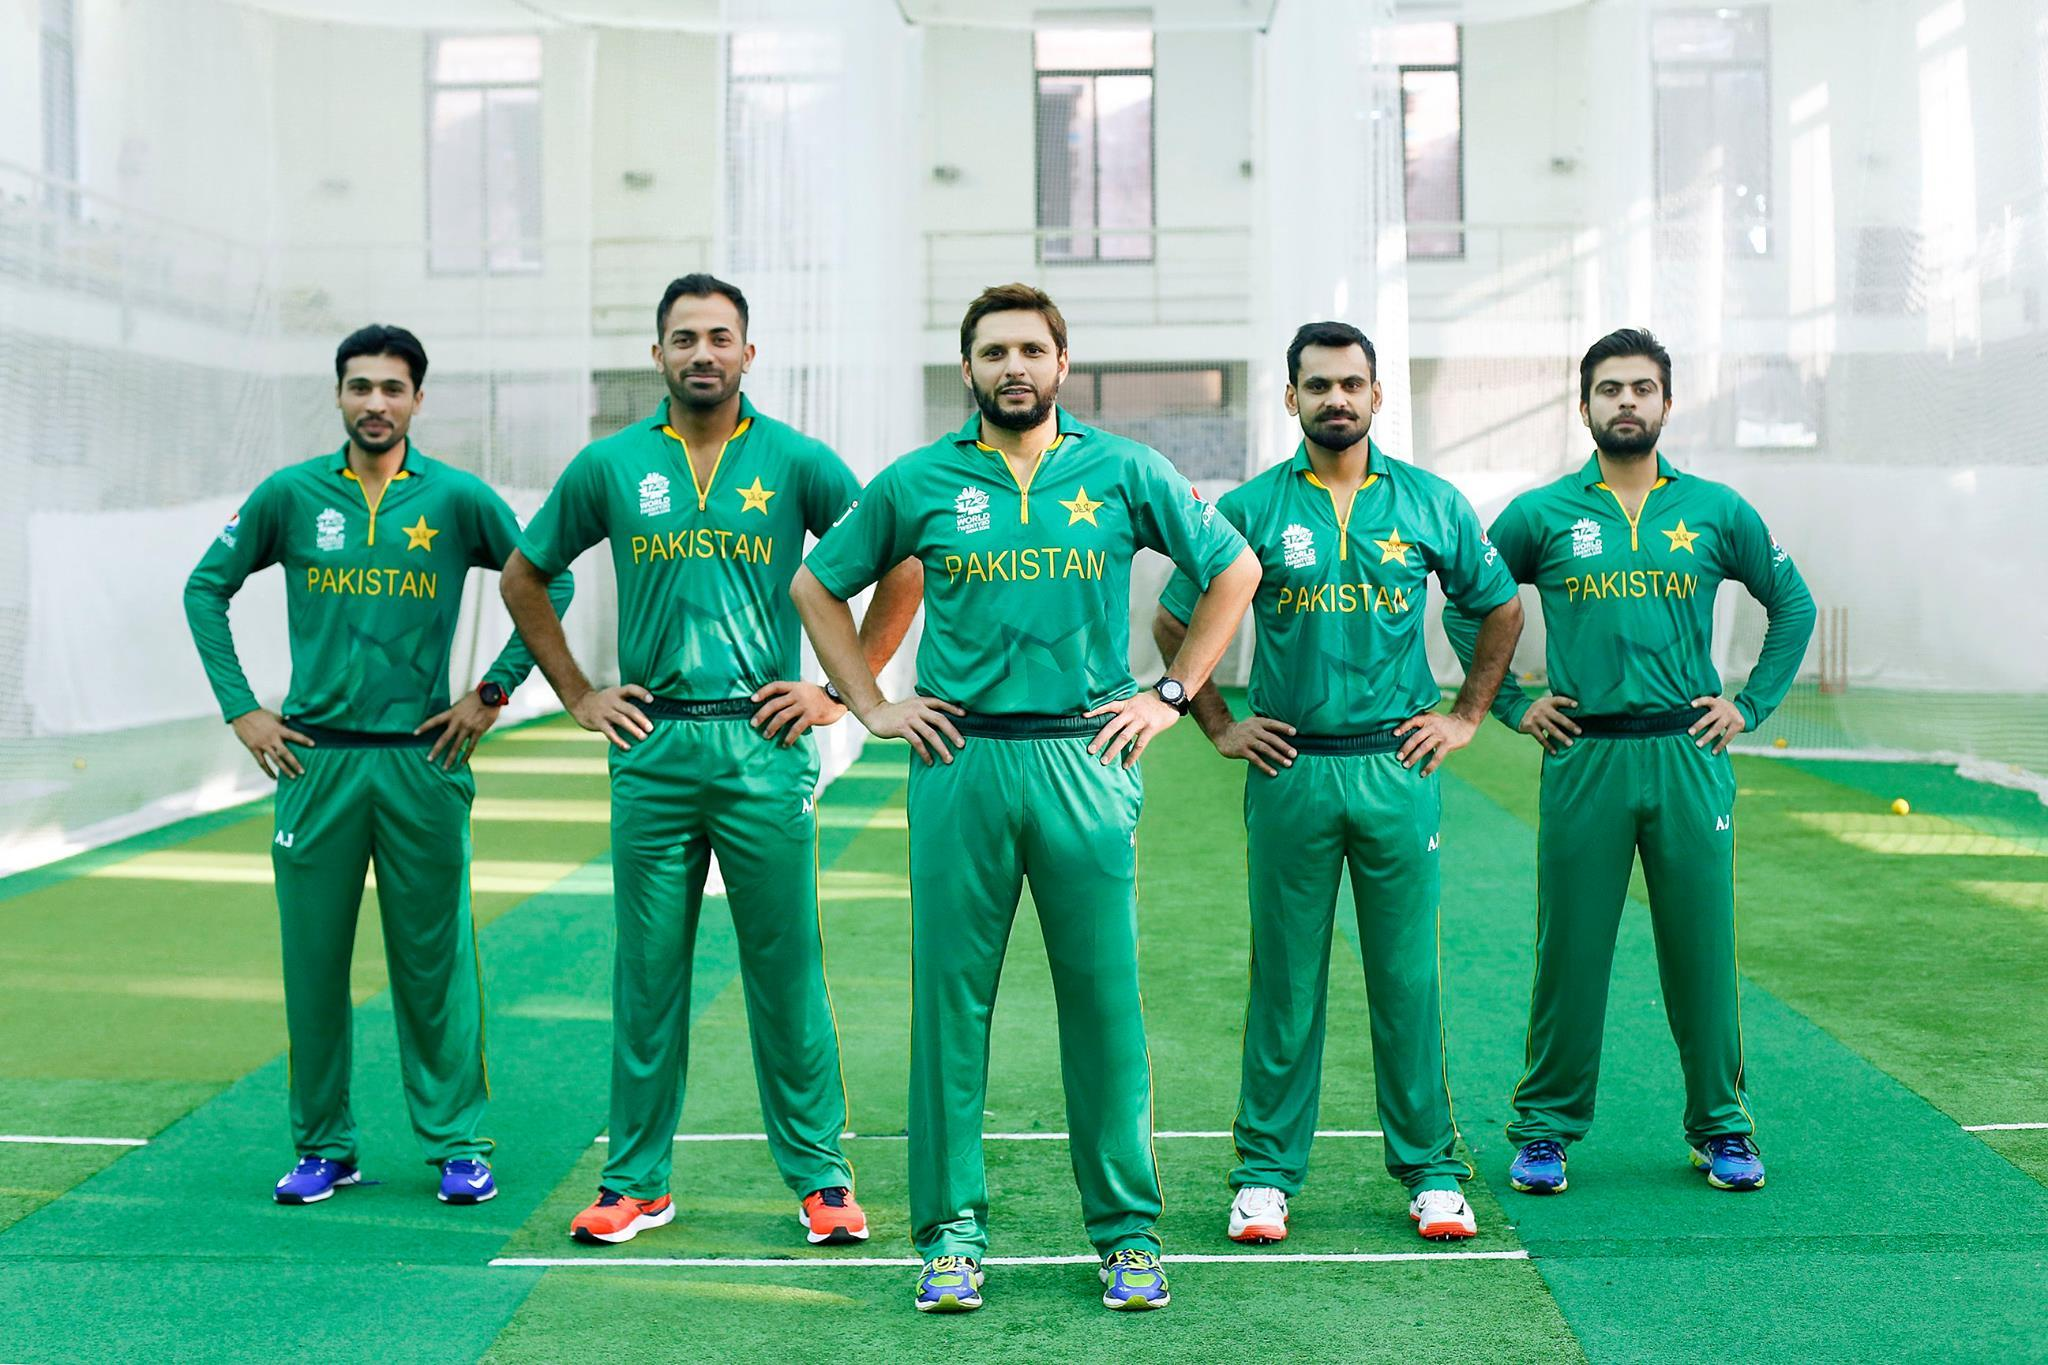 Pakistan Cricket Team Teams Background 2